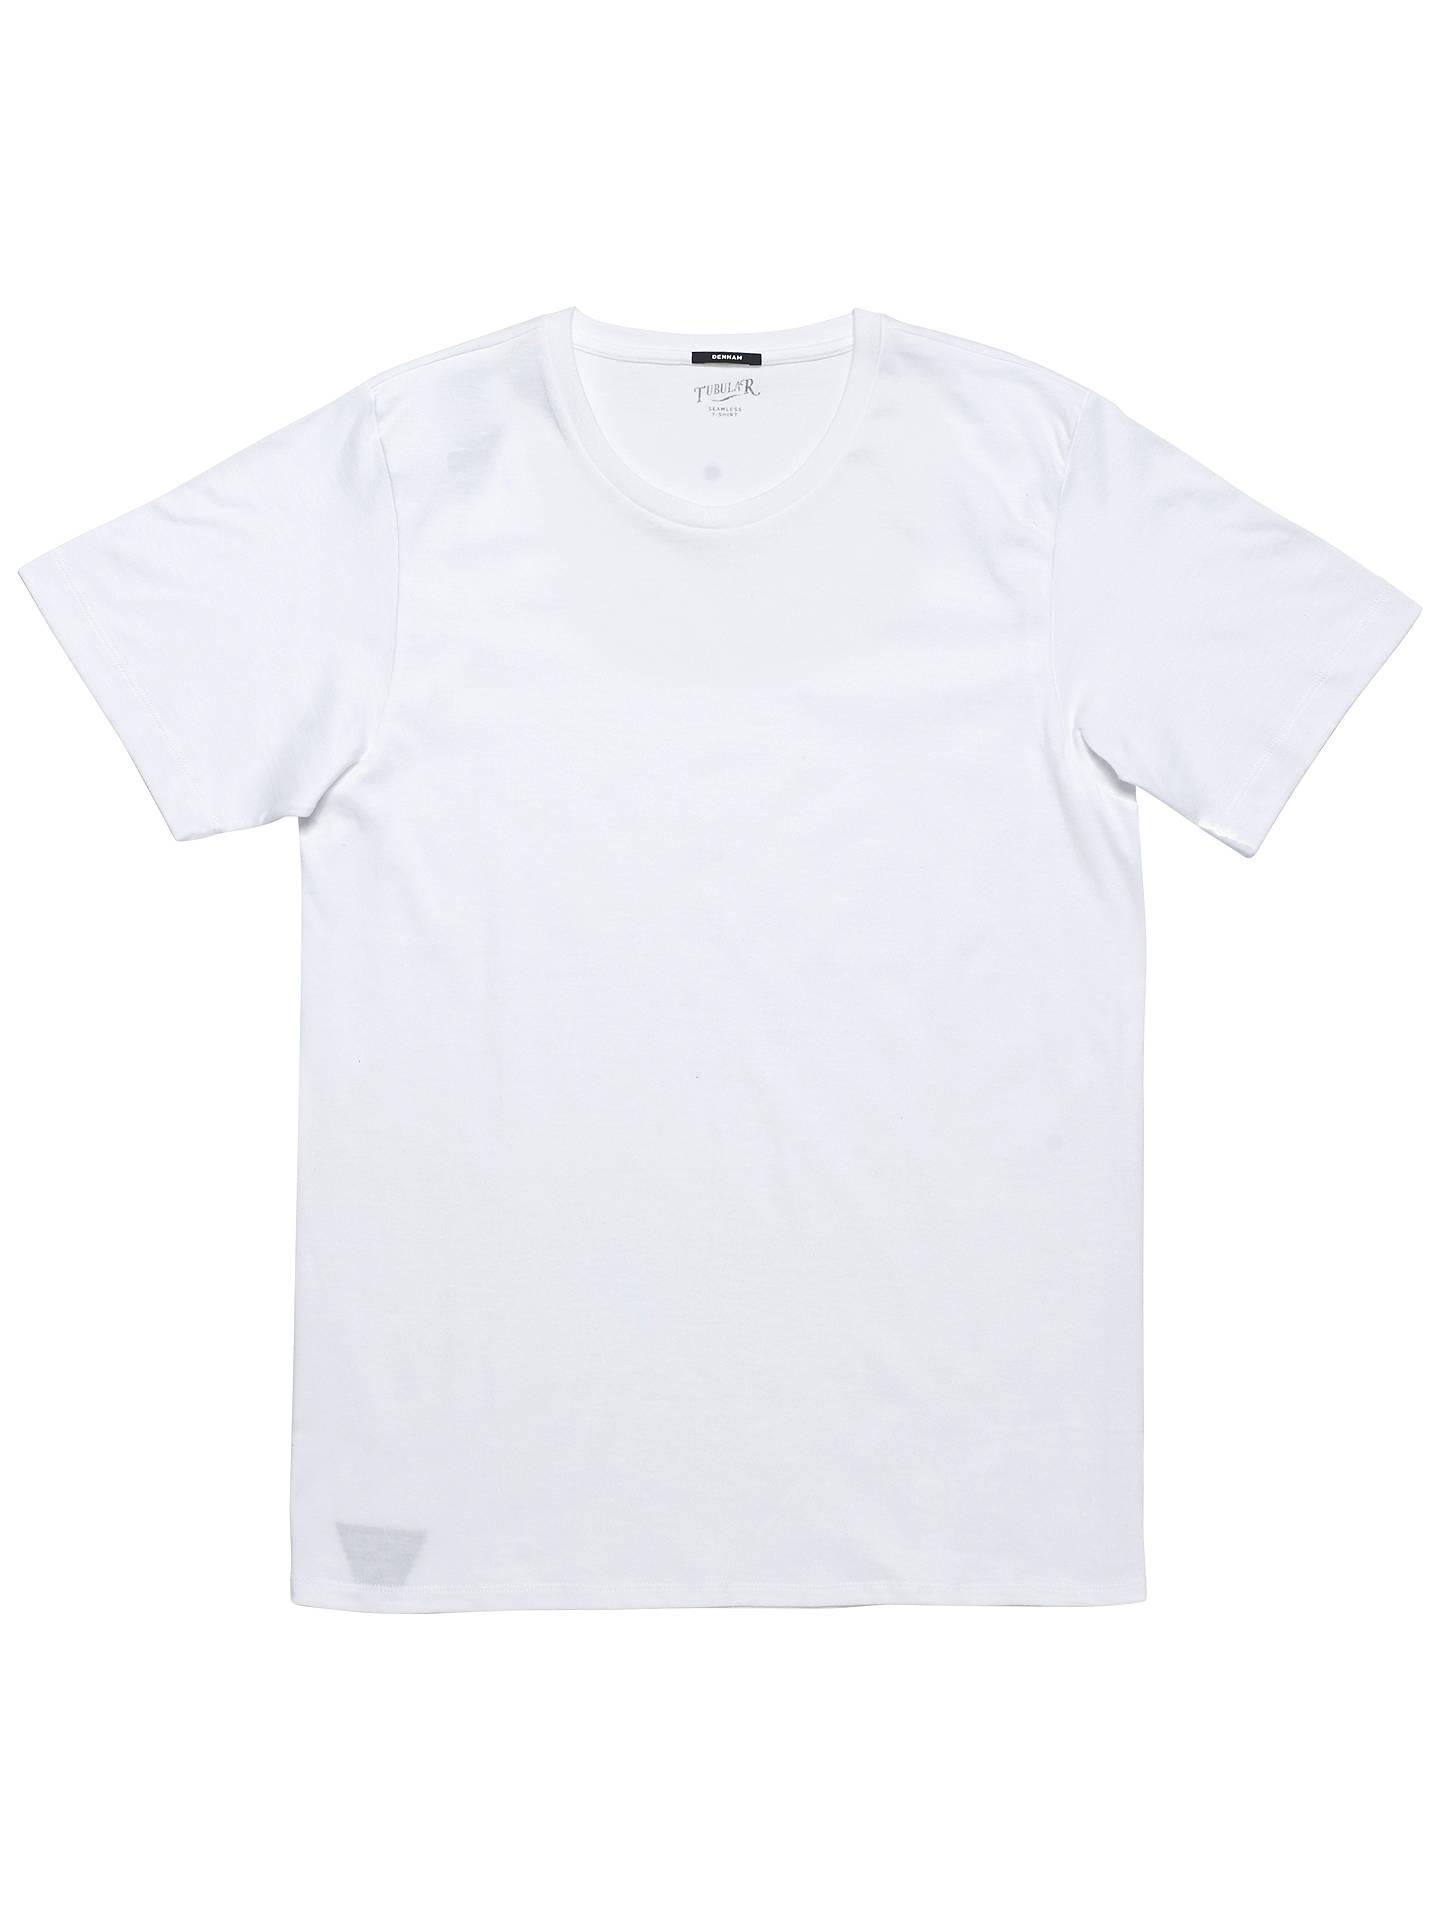 85ebc4c01ef6 Denham Tubular Crew Short Sleeve T-Shirt at John Lewis   Partners